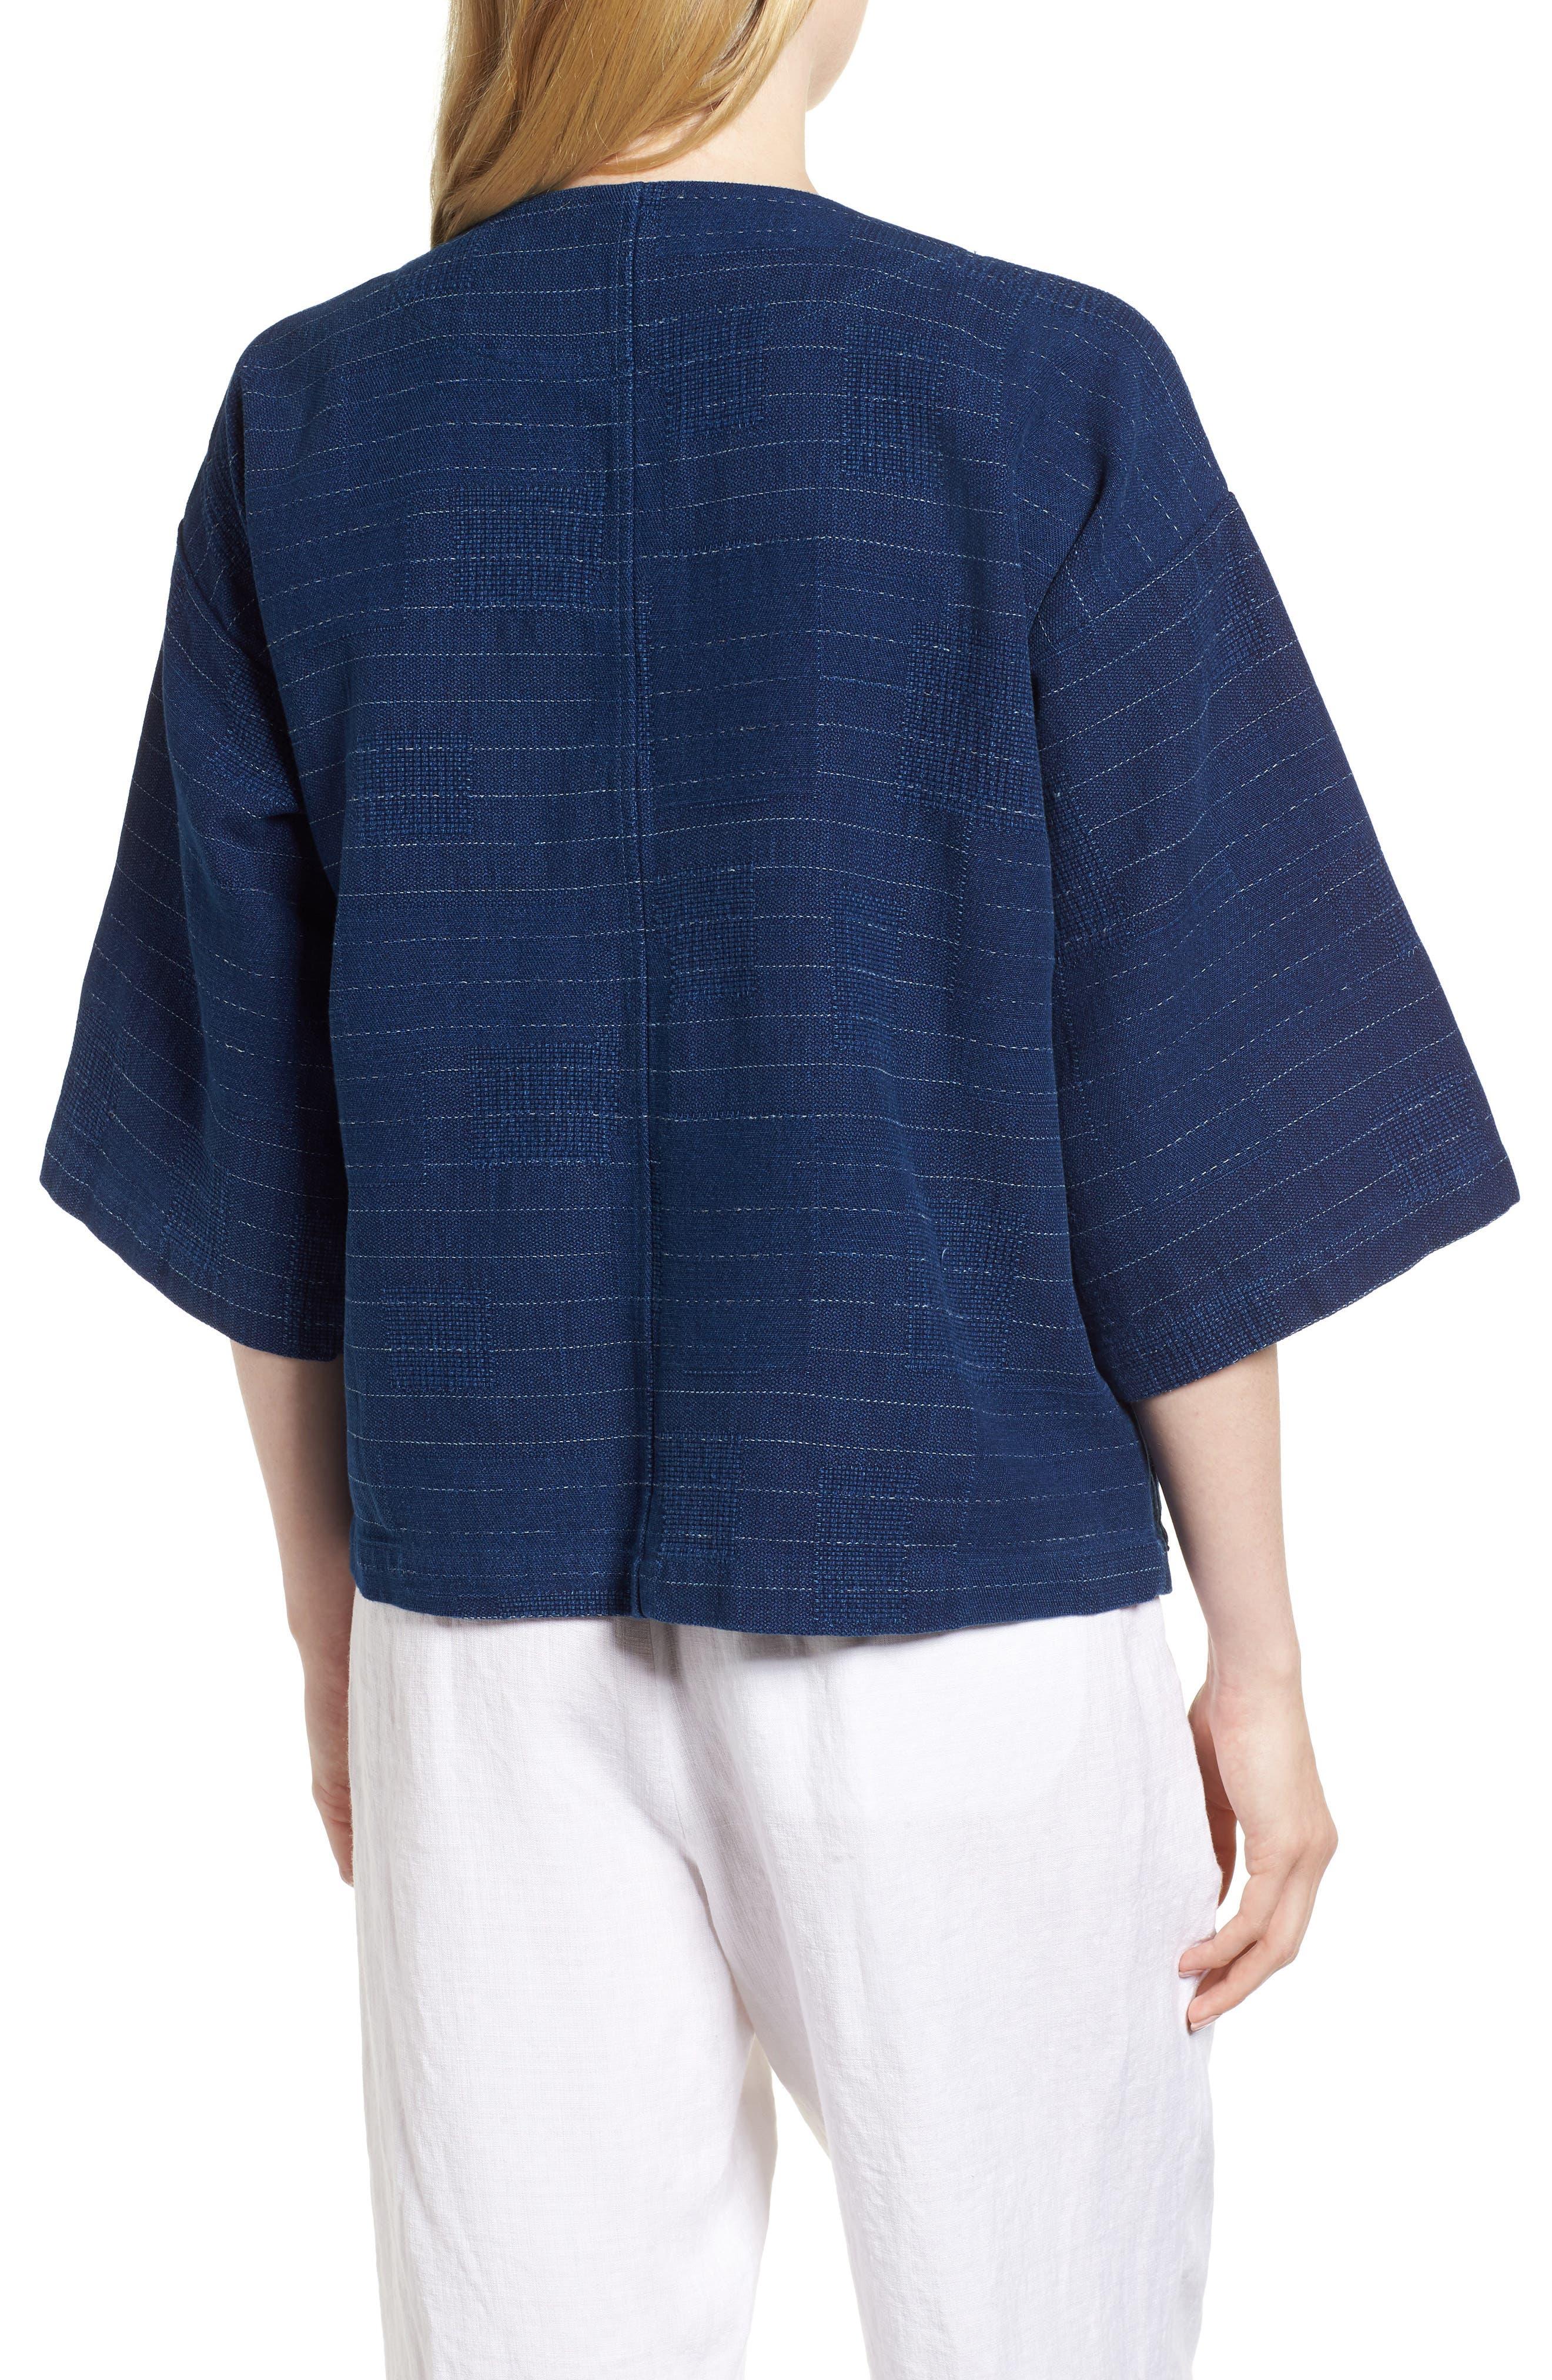 Belted Kimono Jacket,                             Alternate thumbnail 2, color,                             402